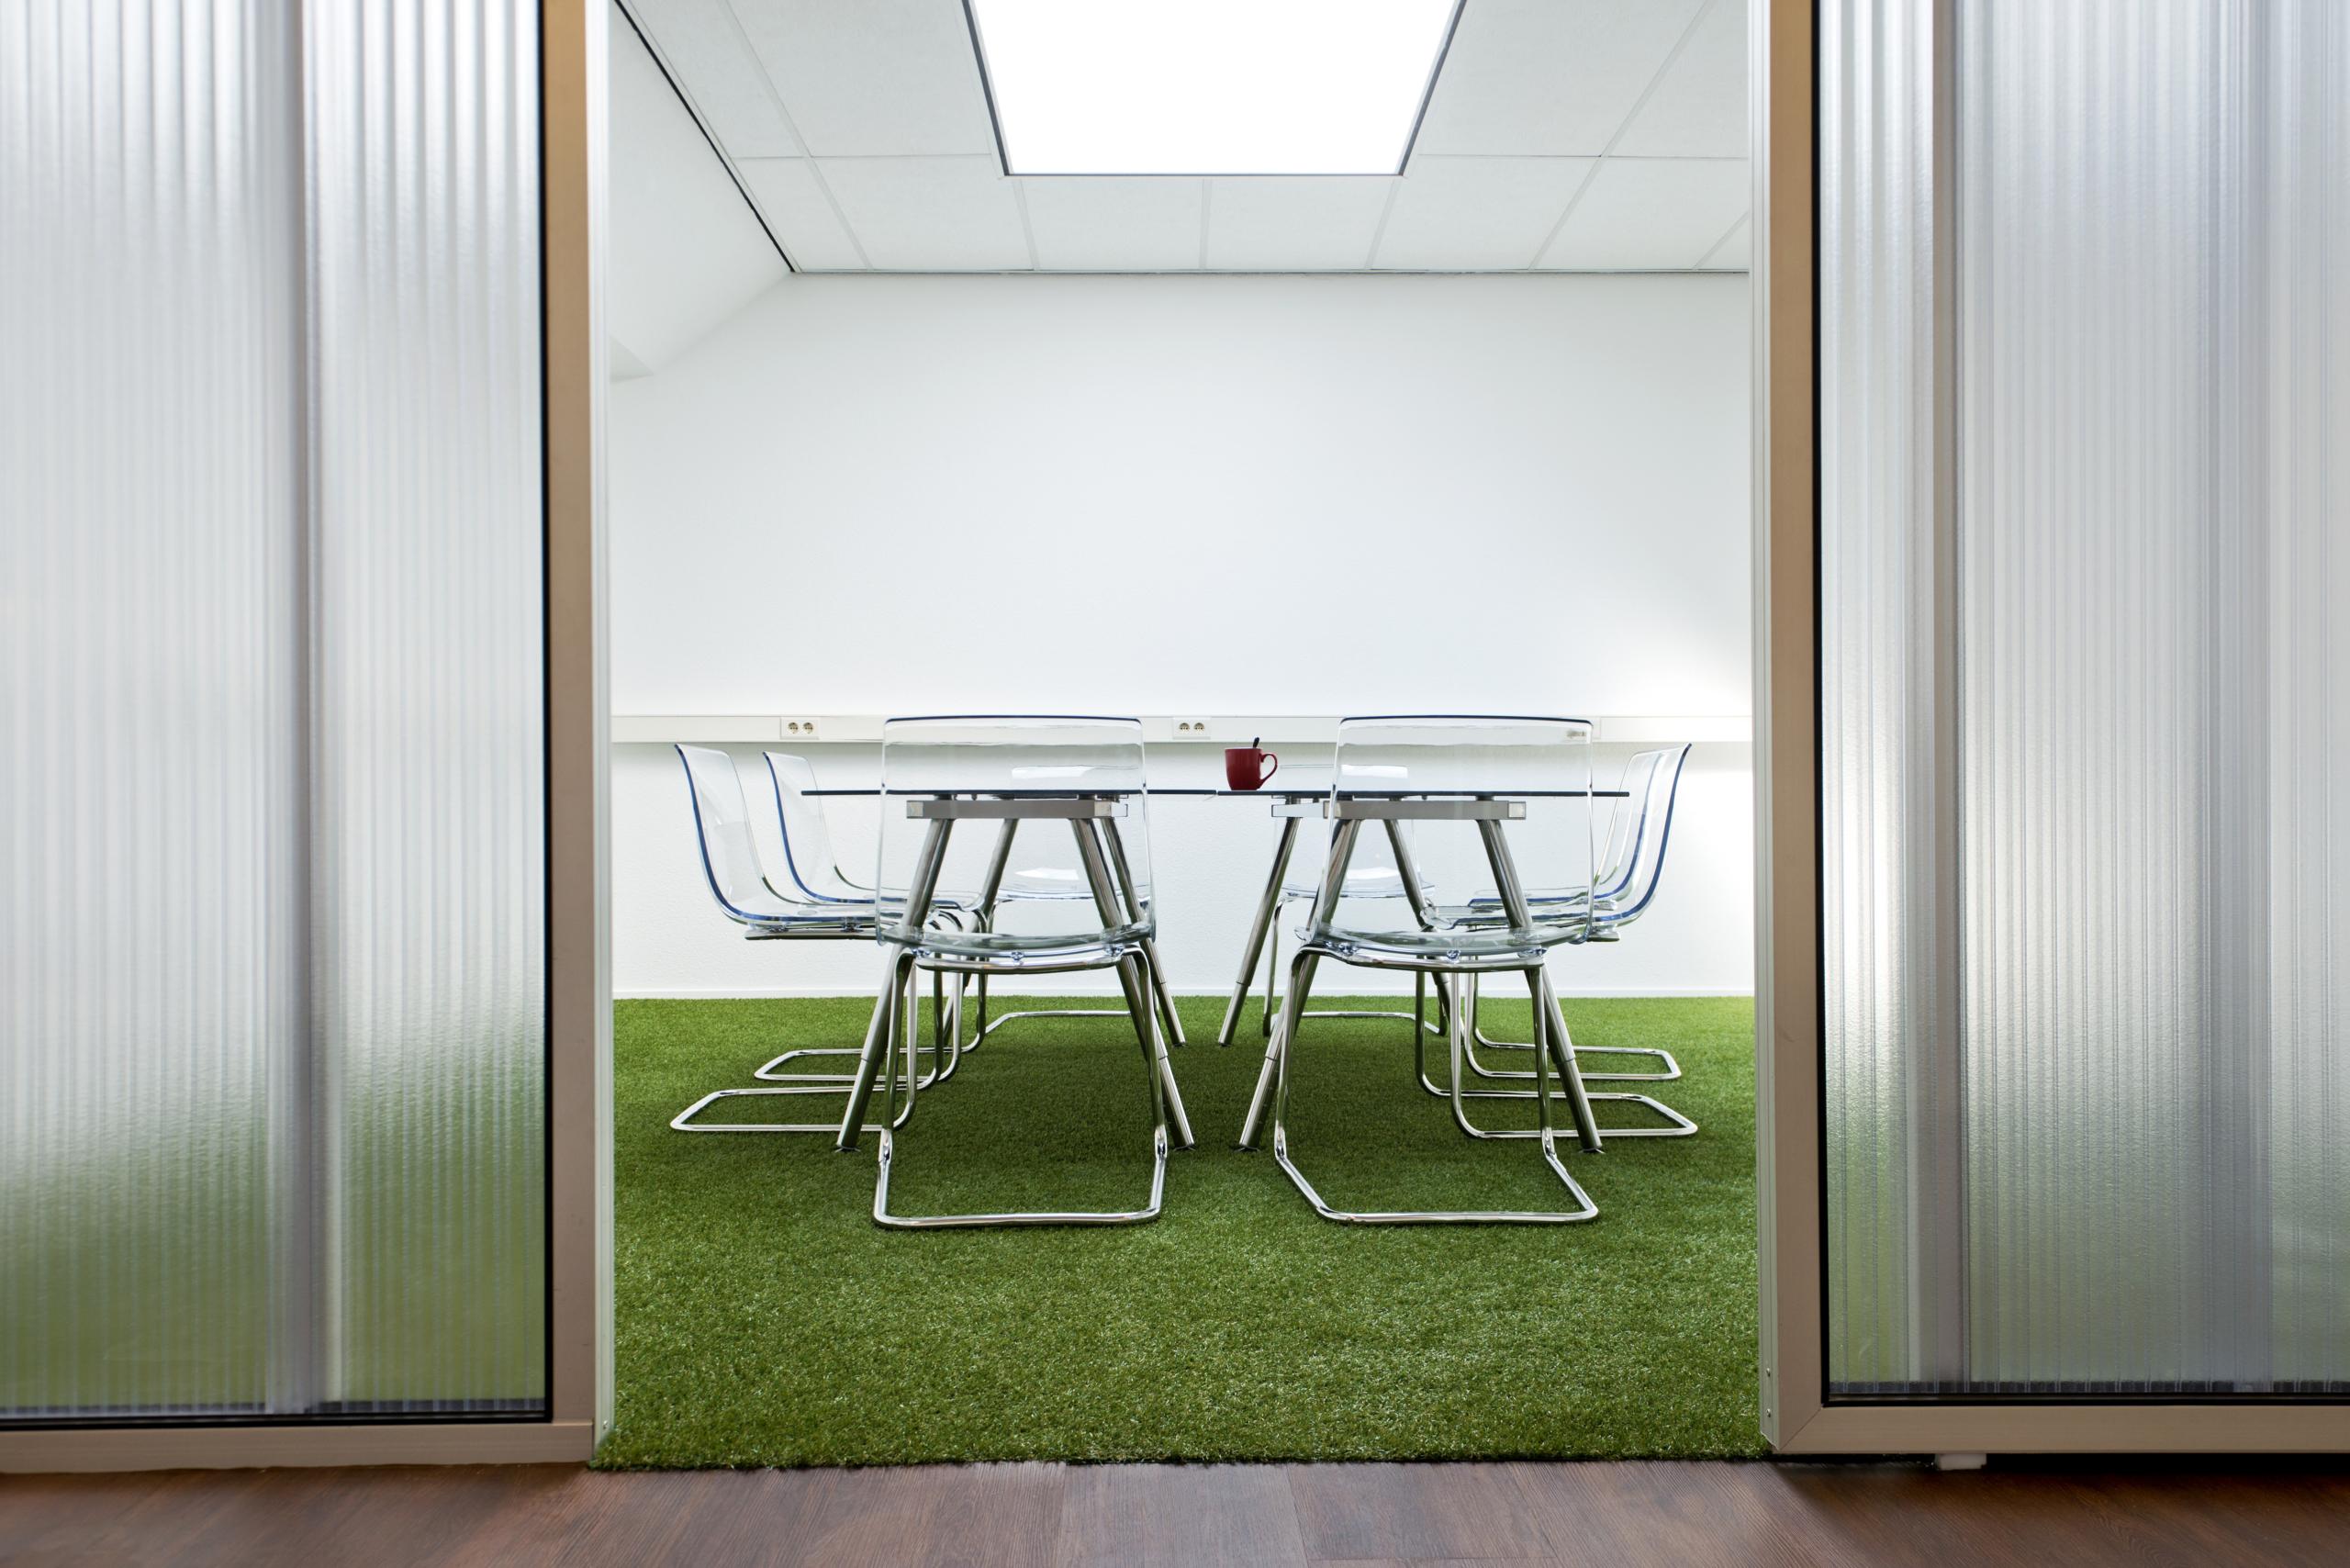 54123 modern meeting room in office ZDFACAM scaled